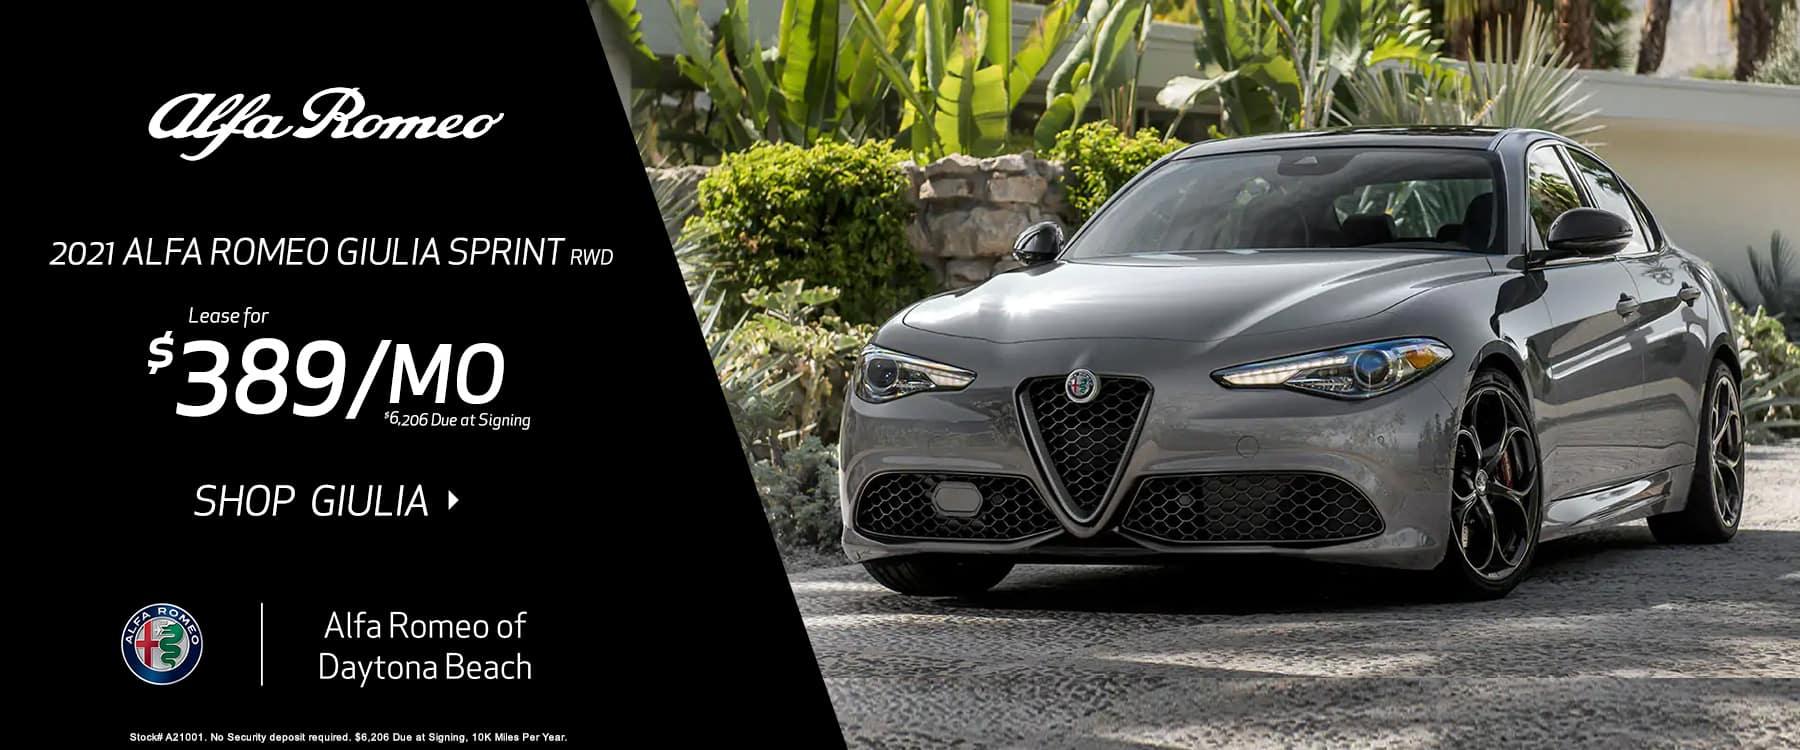 DMAR-2110-Alfa-Romeo-1800×750-01